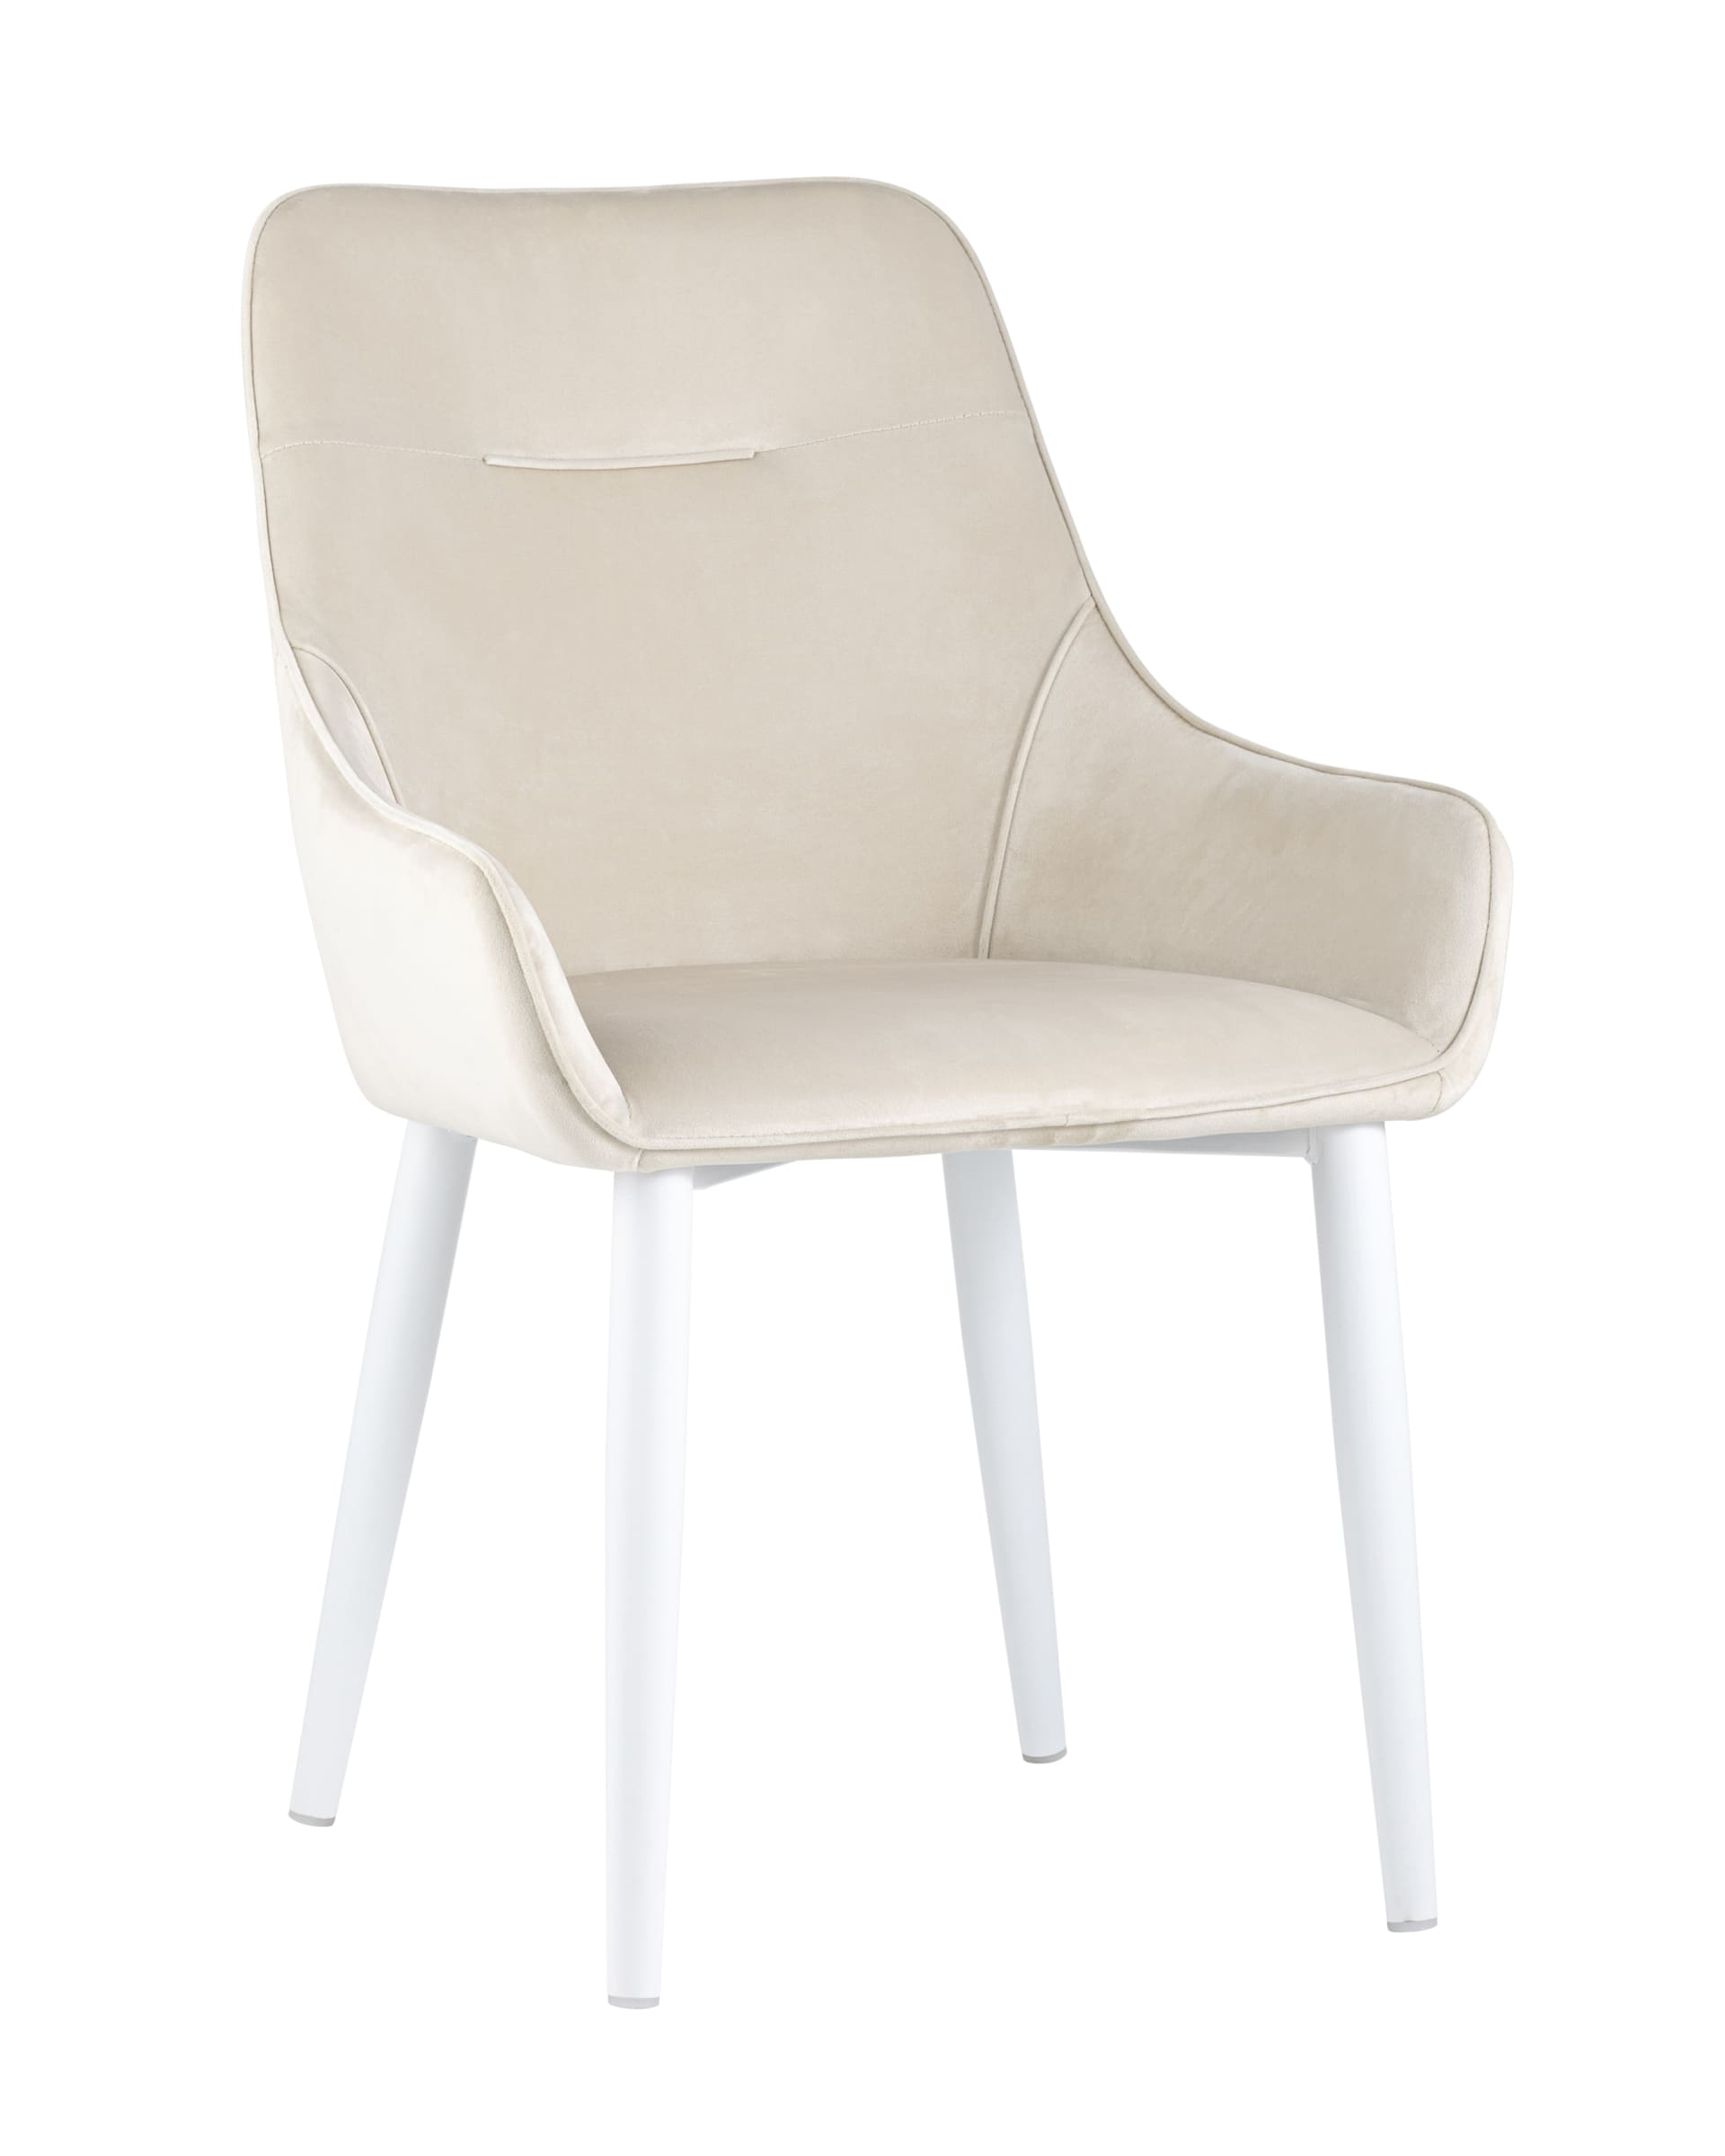 Стул диана (stool group) белый 56x87x45 см.